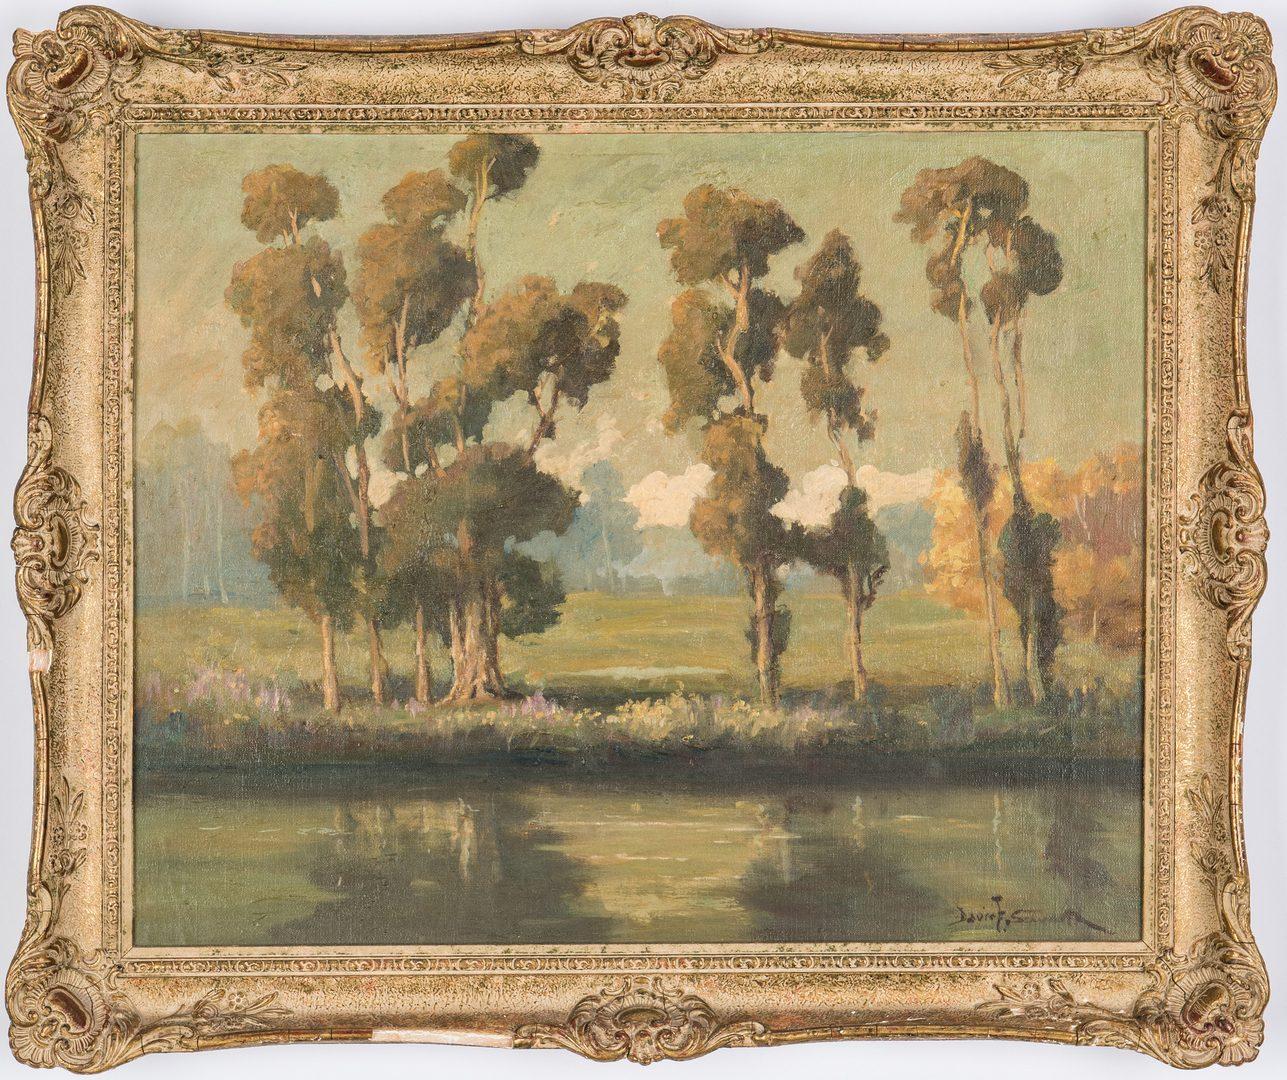 Lot 92: Davis Schwartz Landscape with Eucalyptus